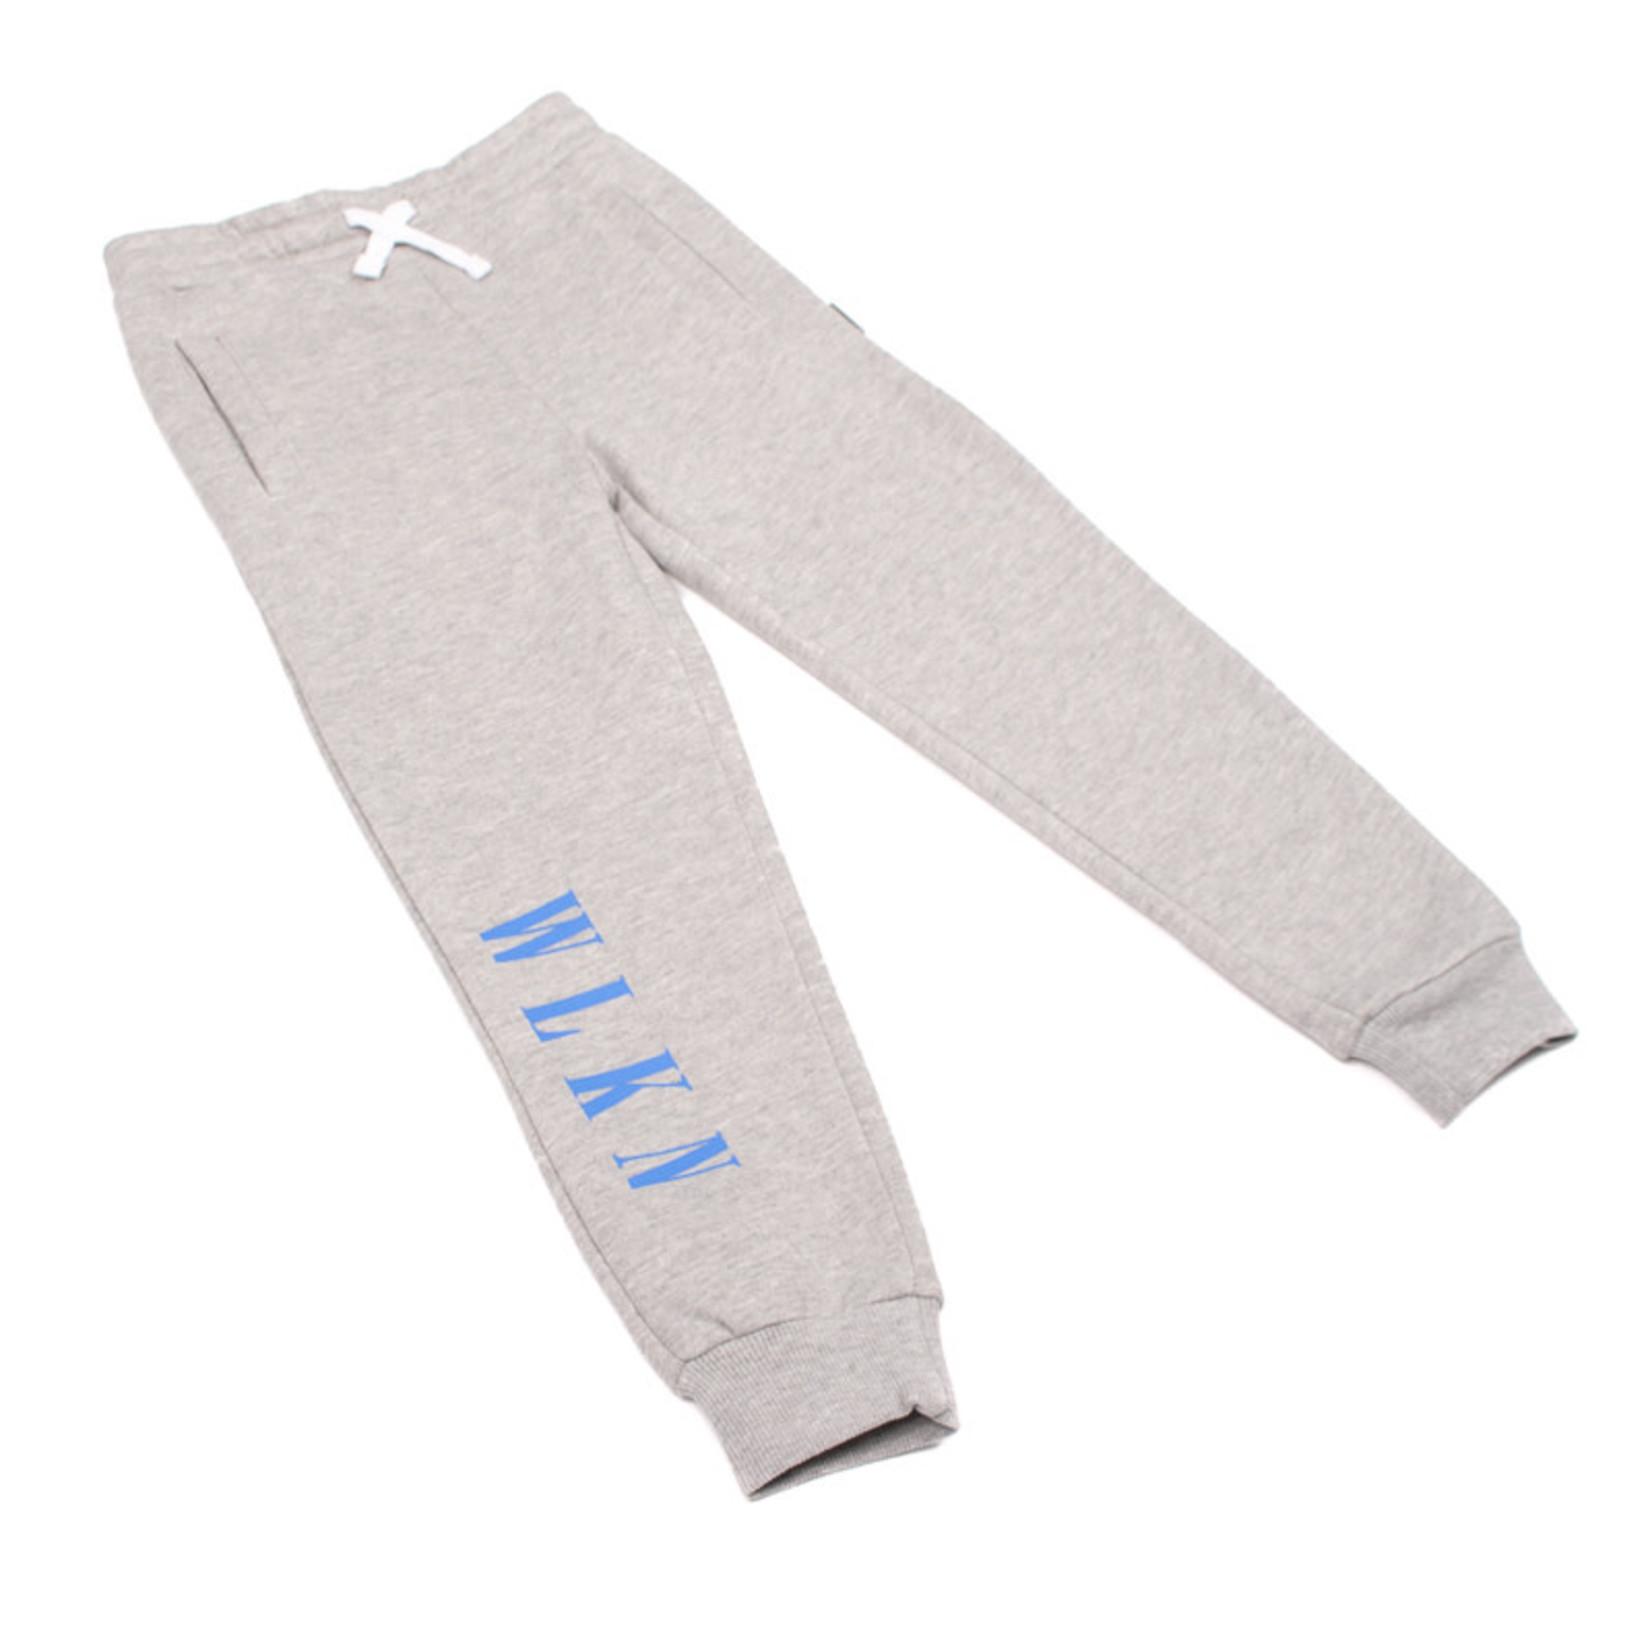 WLKN WLKN : Junior Maylo Sweatpants